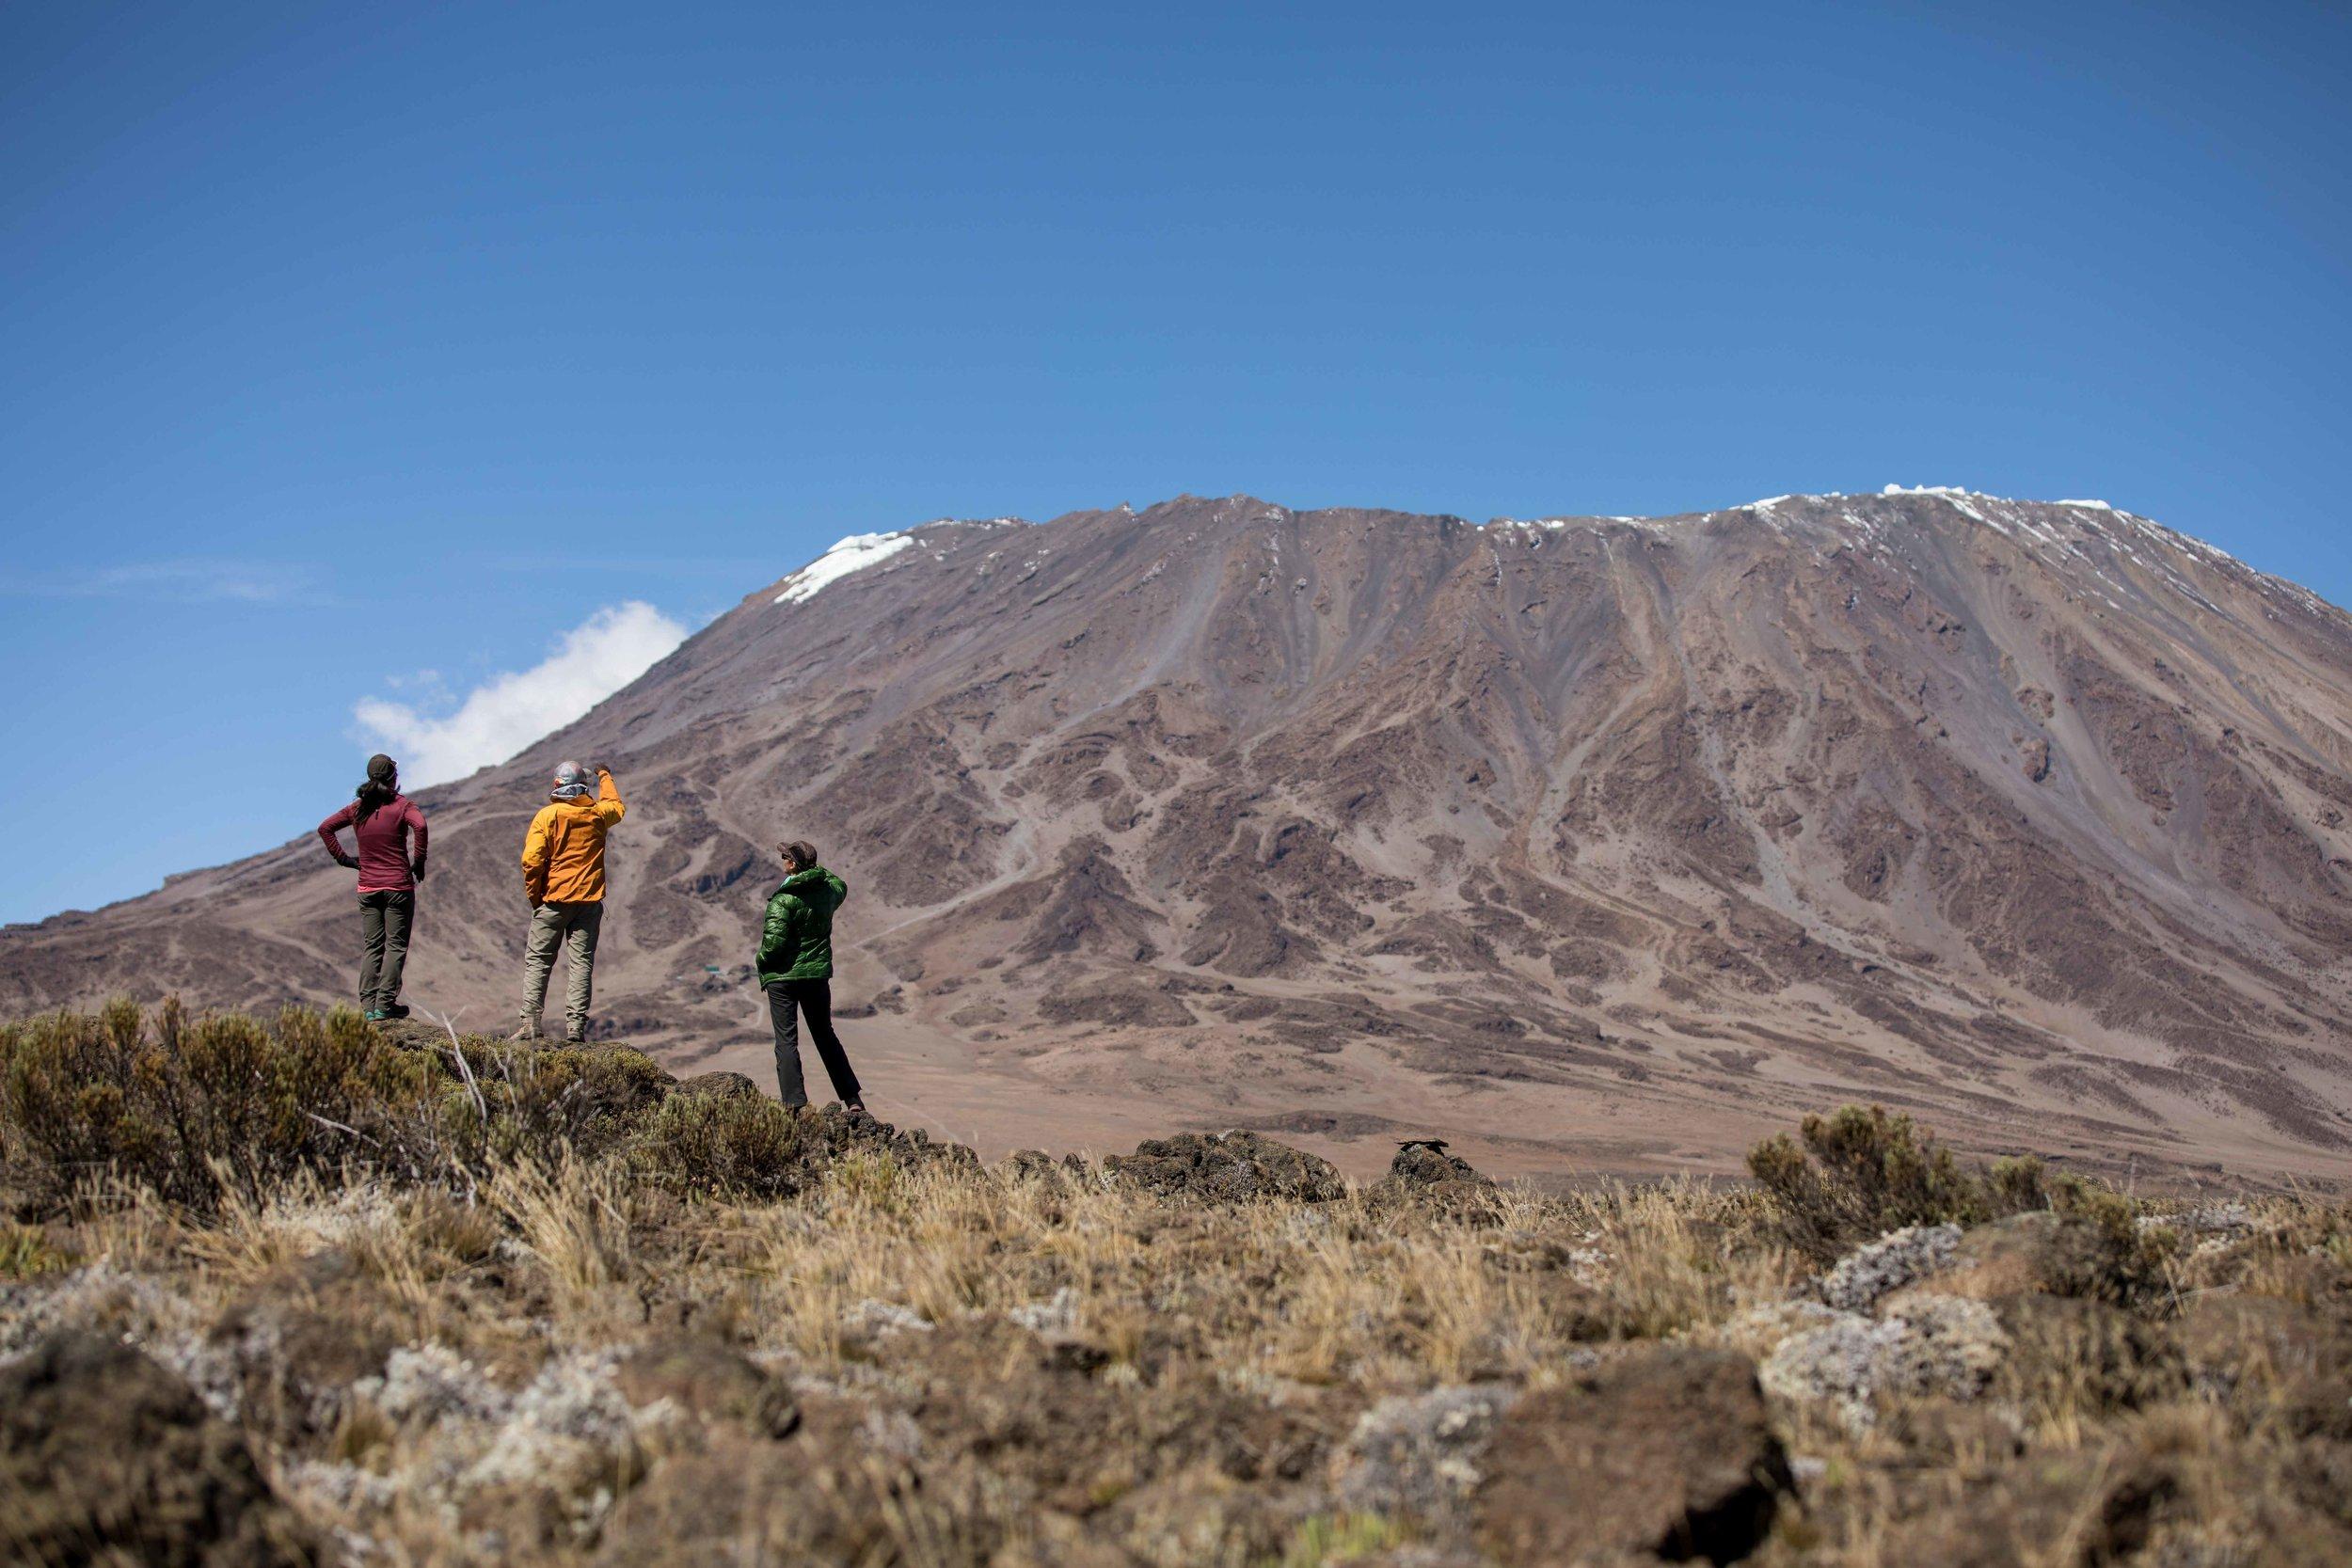 ajw_REI_Kilimanjaro-33.jpg